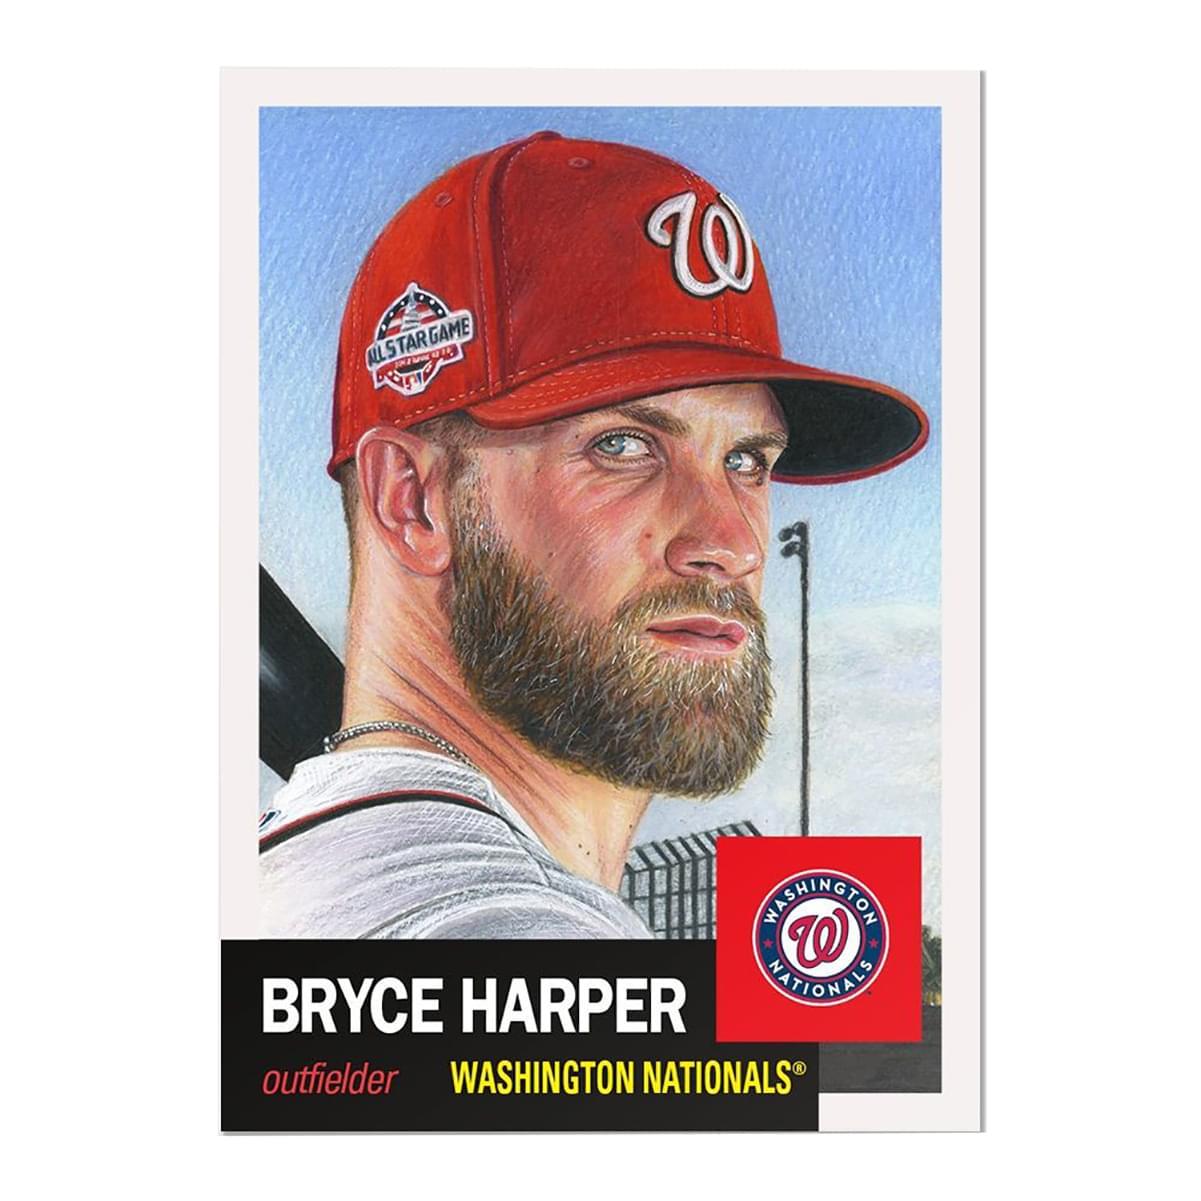 Washington Nationals #13 Bryce Harper MLB Topps Living Set Card